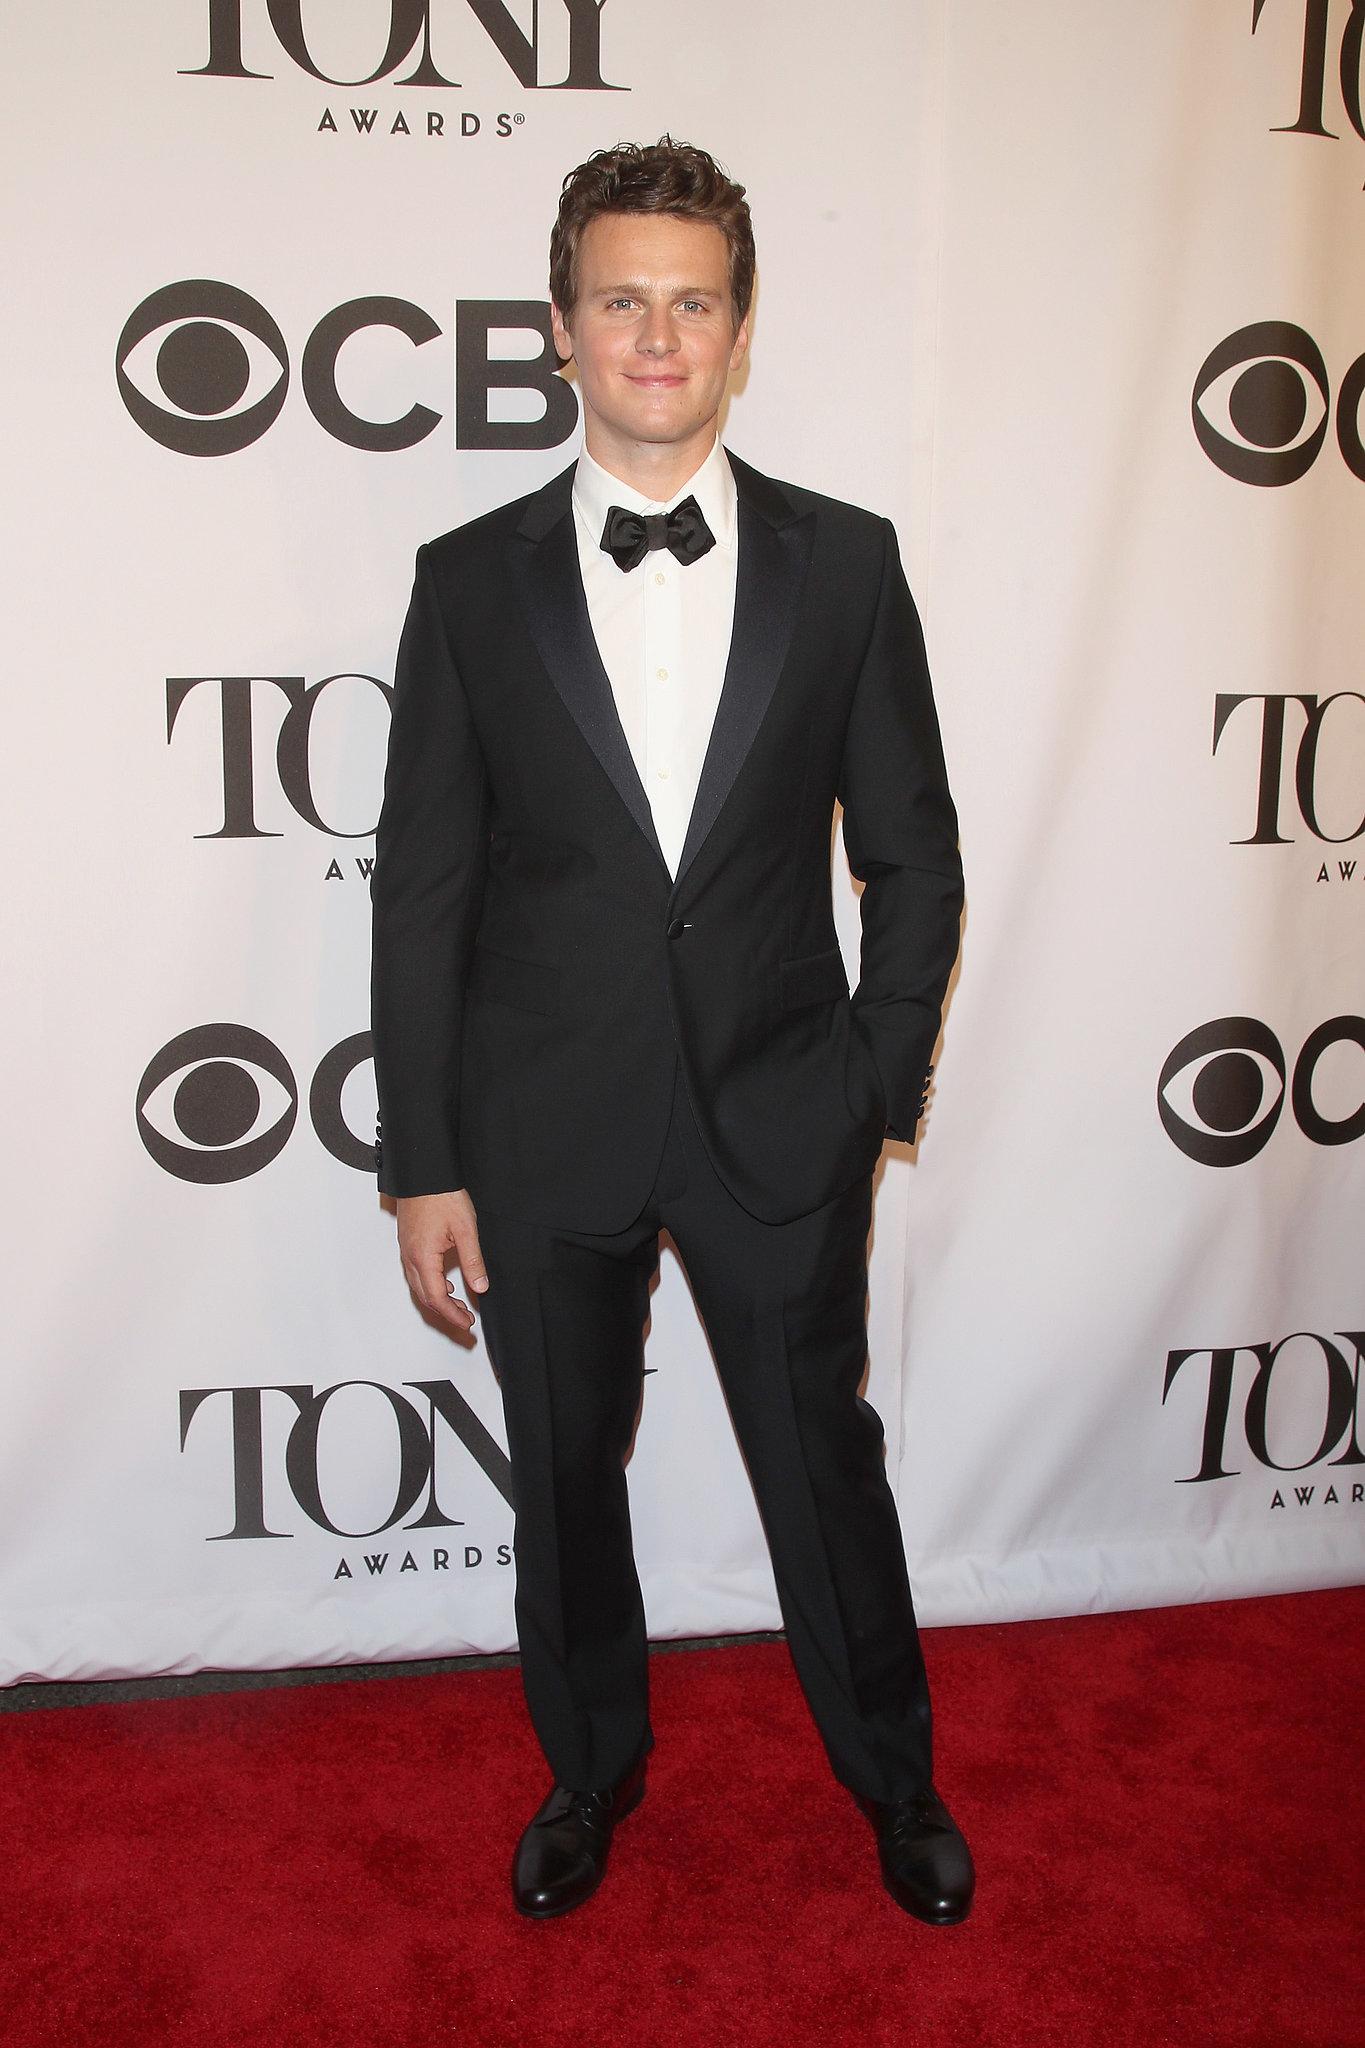 Jonathan Groff looked handsome in his tuxedo.